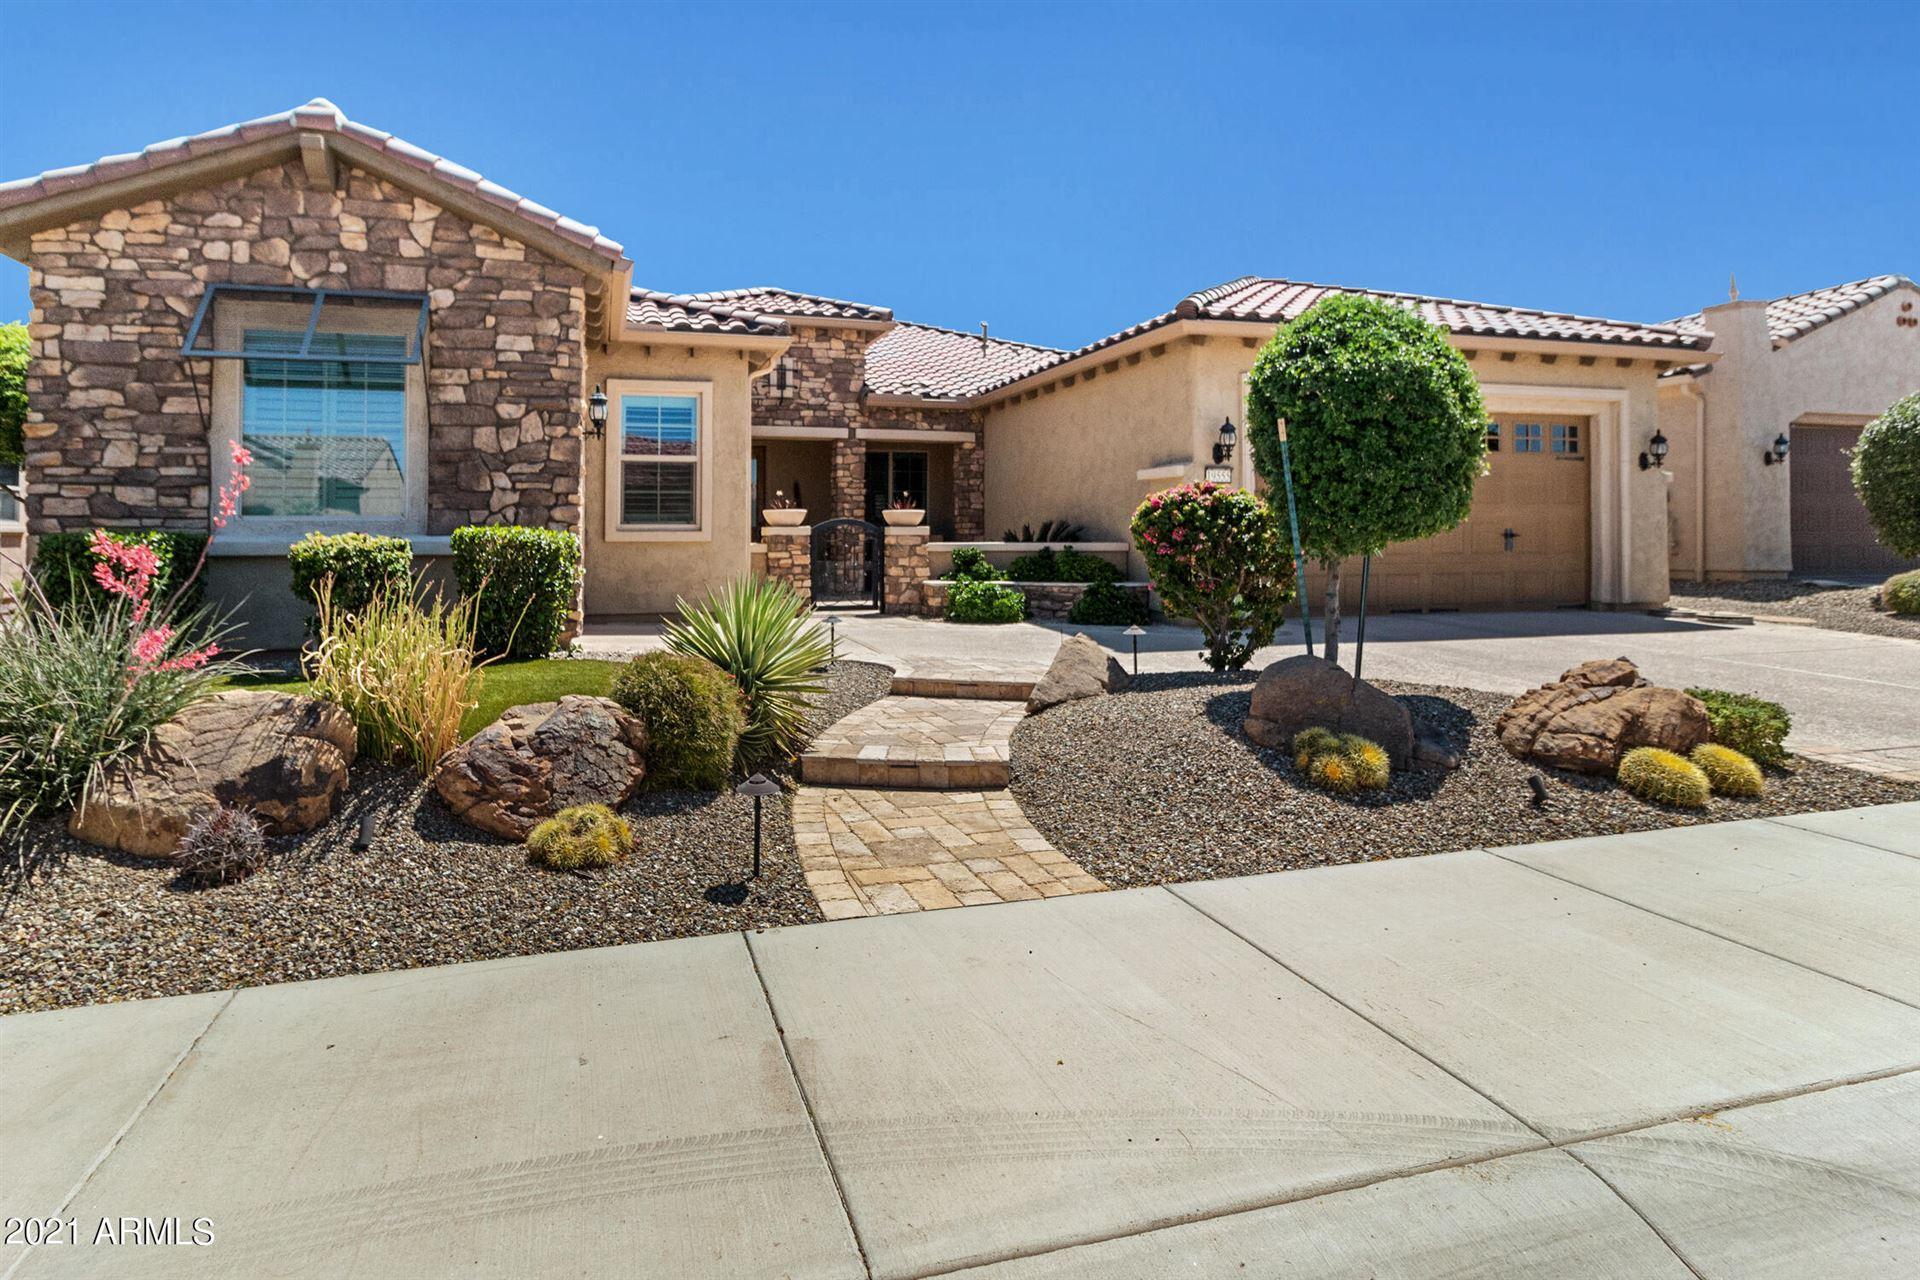 Photo of 19555 N 269TH Drive, Buckeye, AZ 85396 (MLS # 6231931)